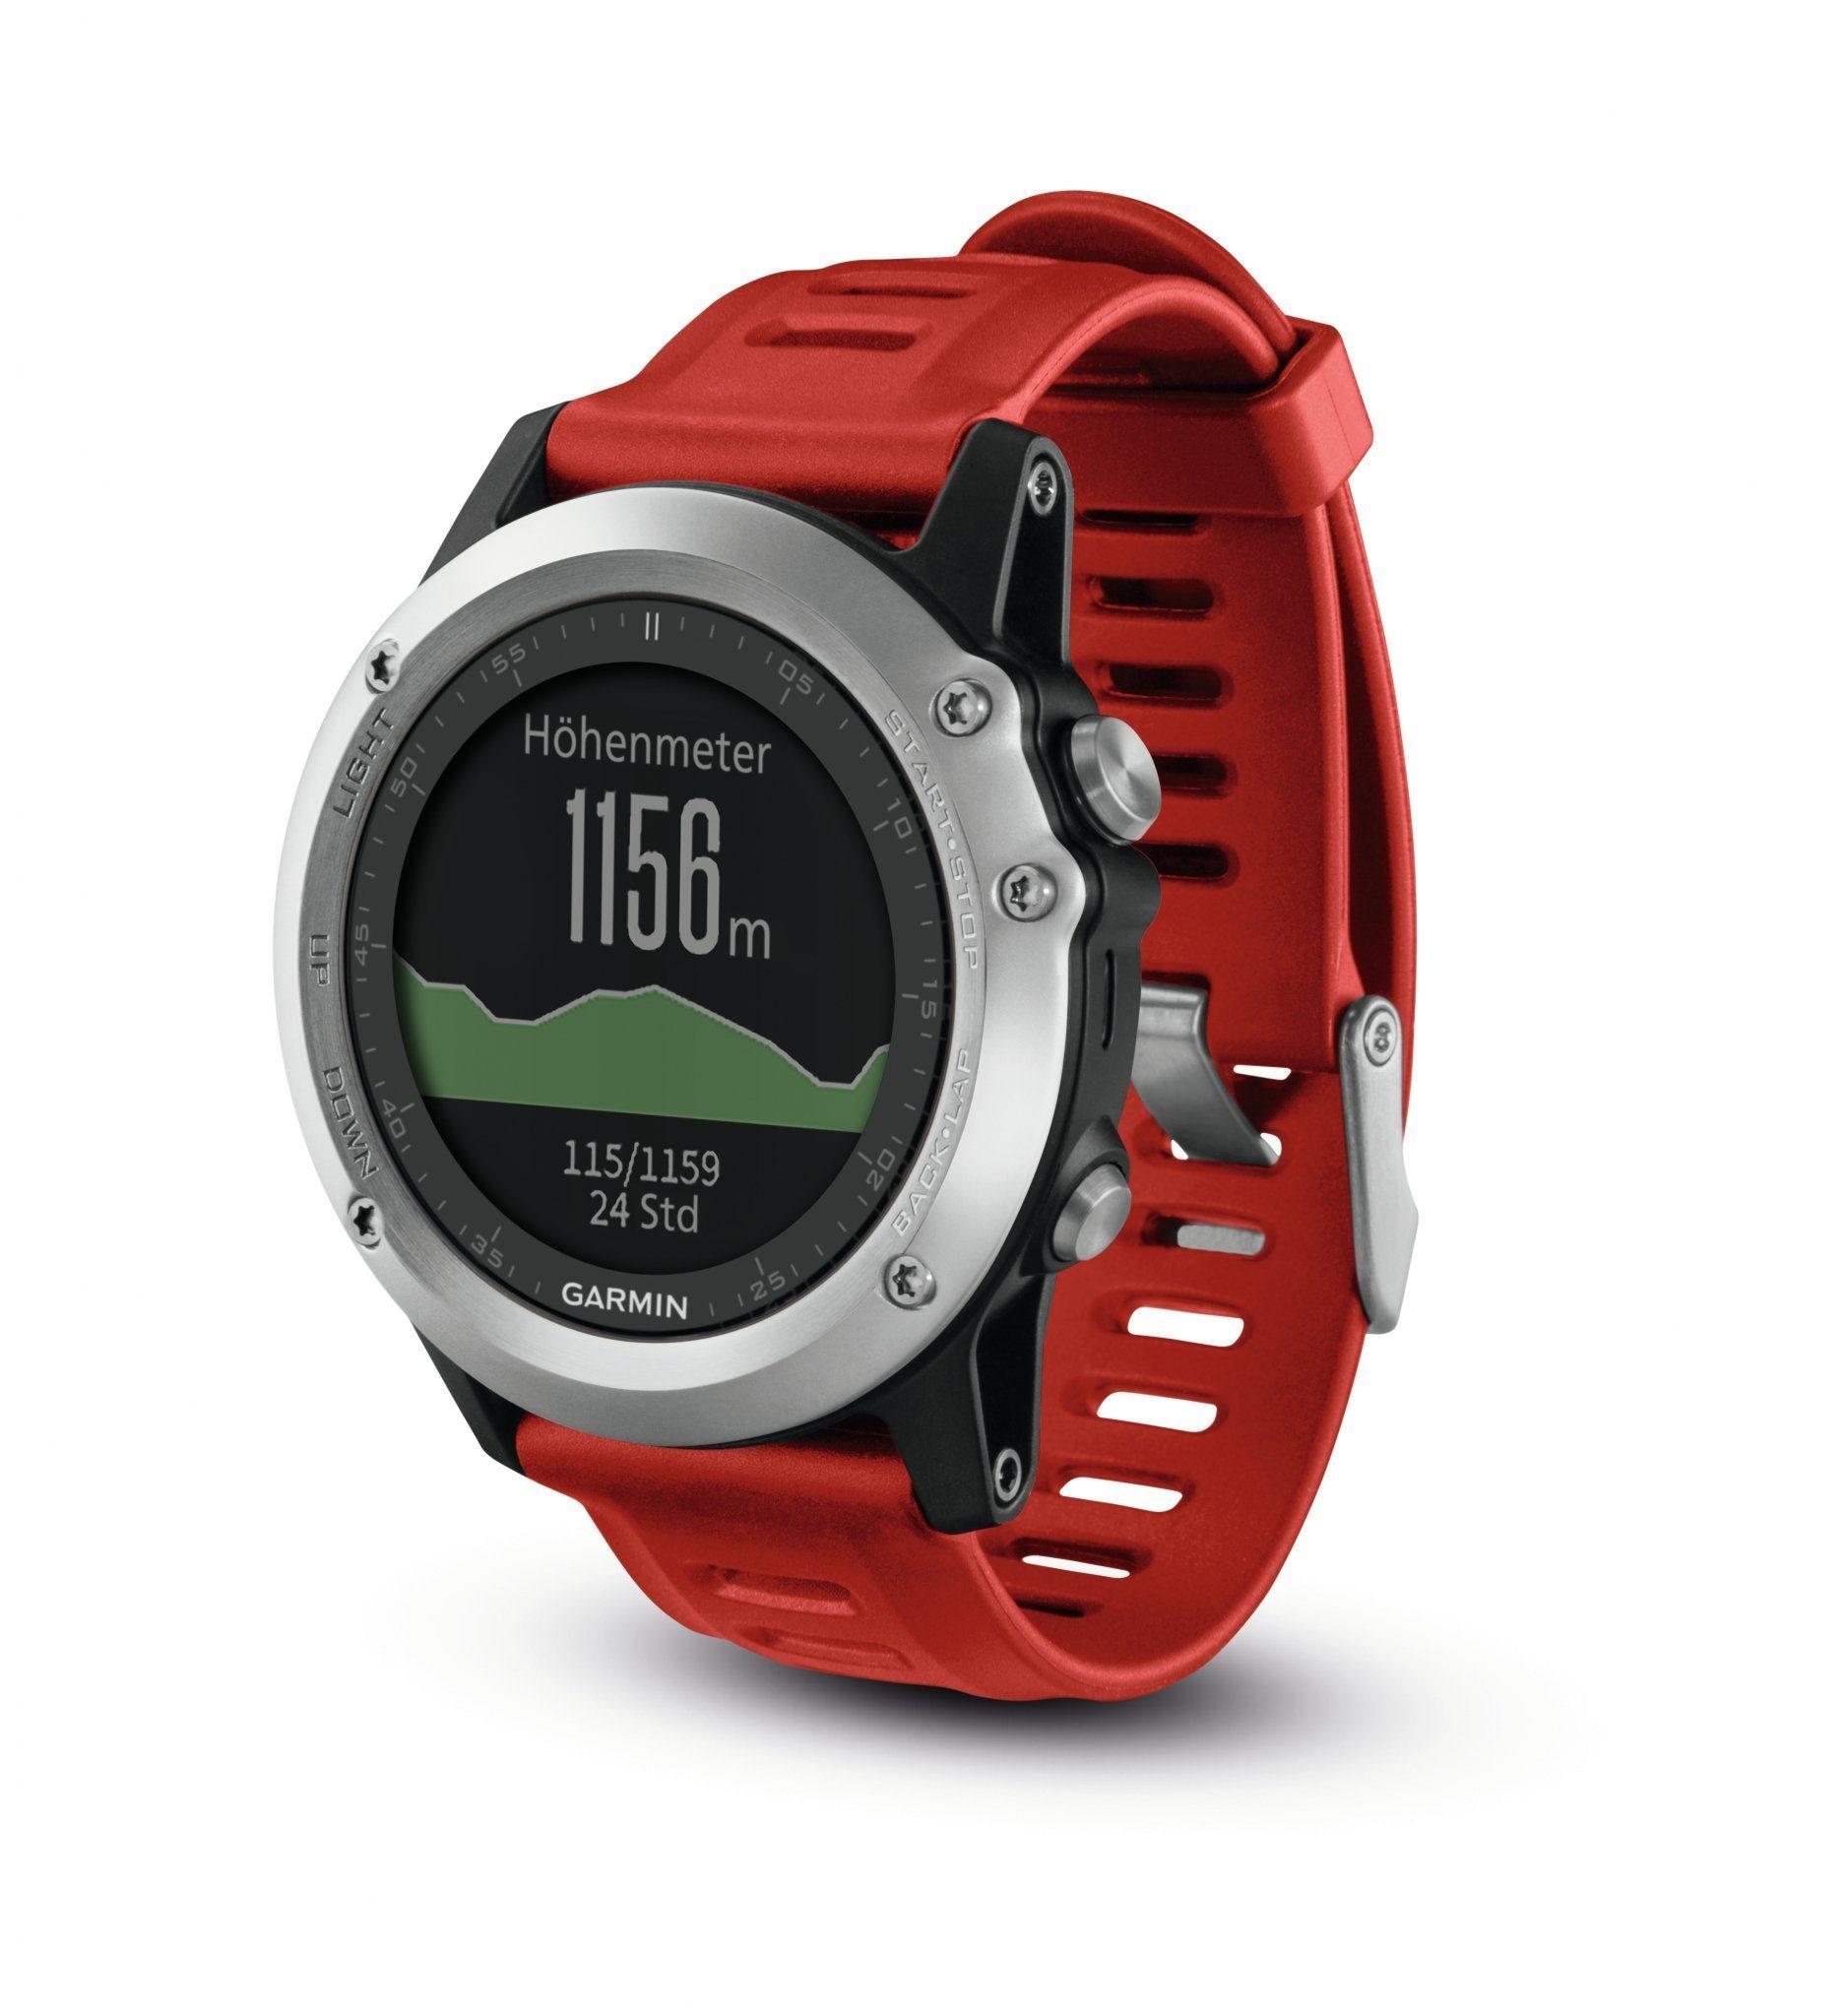 Garmin Sportuhr »Fenix 3 GPS Multisportuhr Performer Bundle«